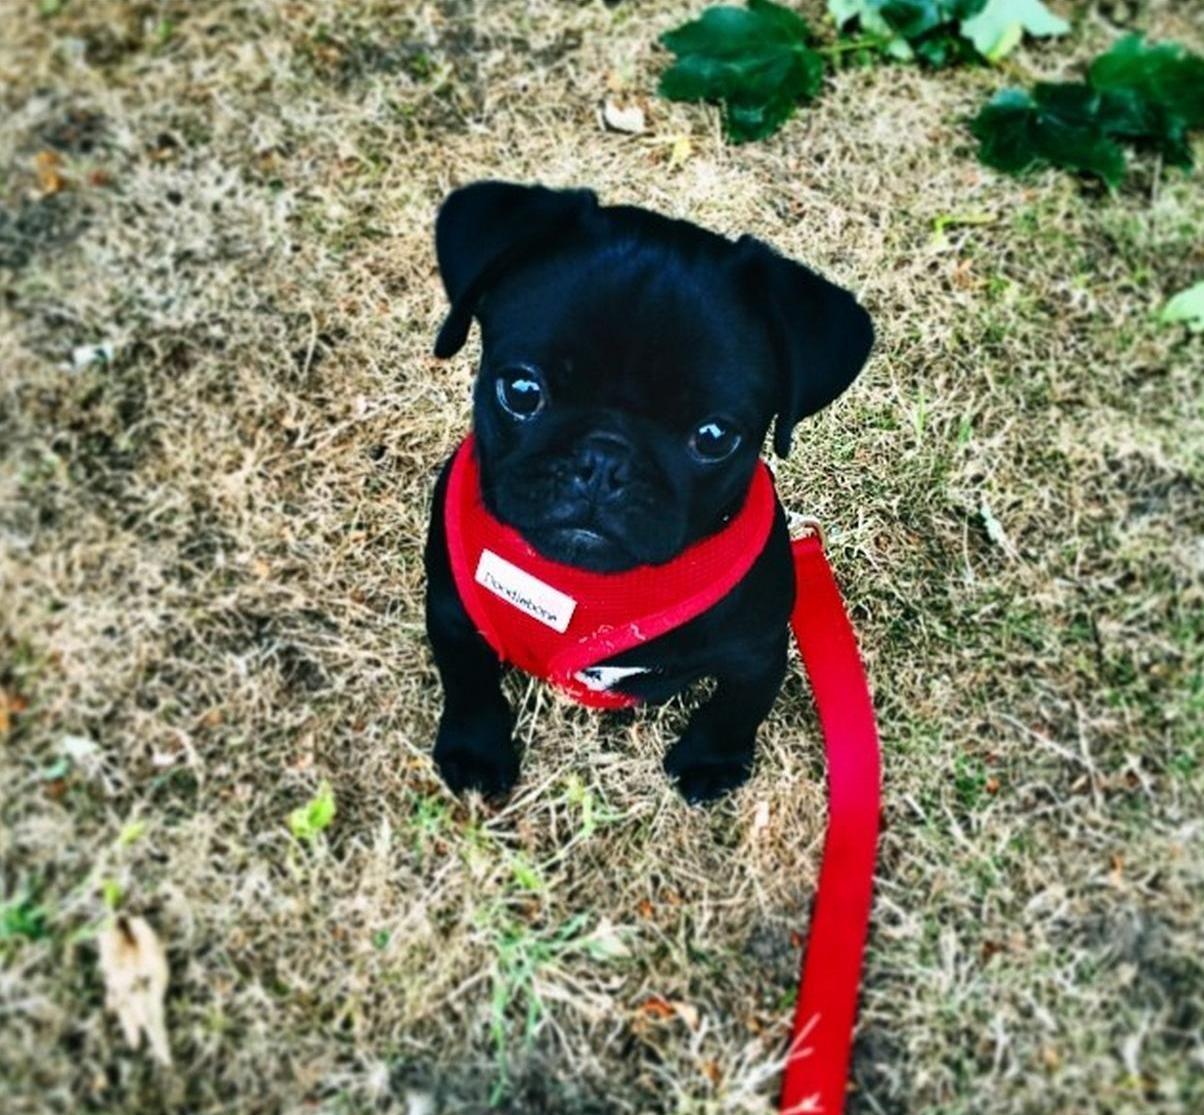 Little Pablo The Cutest Pug In The World Cute Pugs Pugs Cute